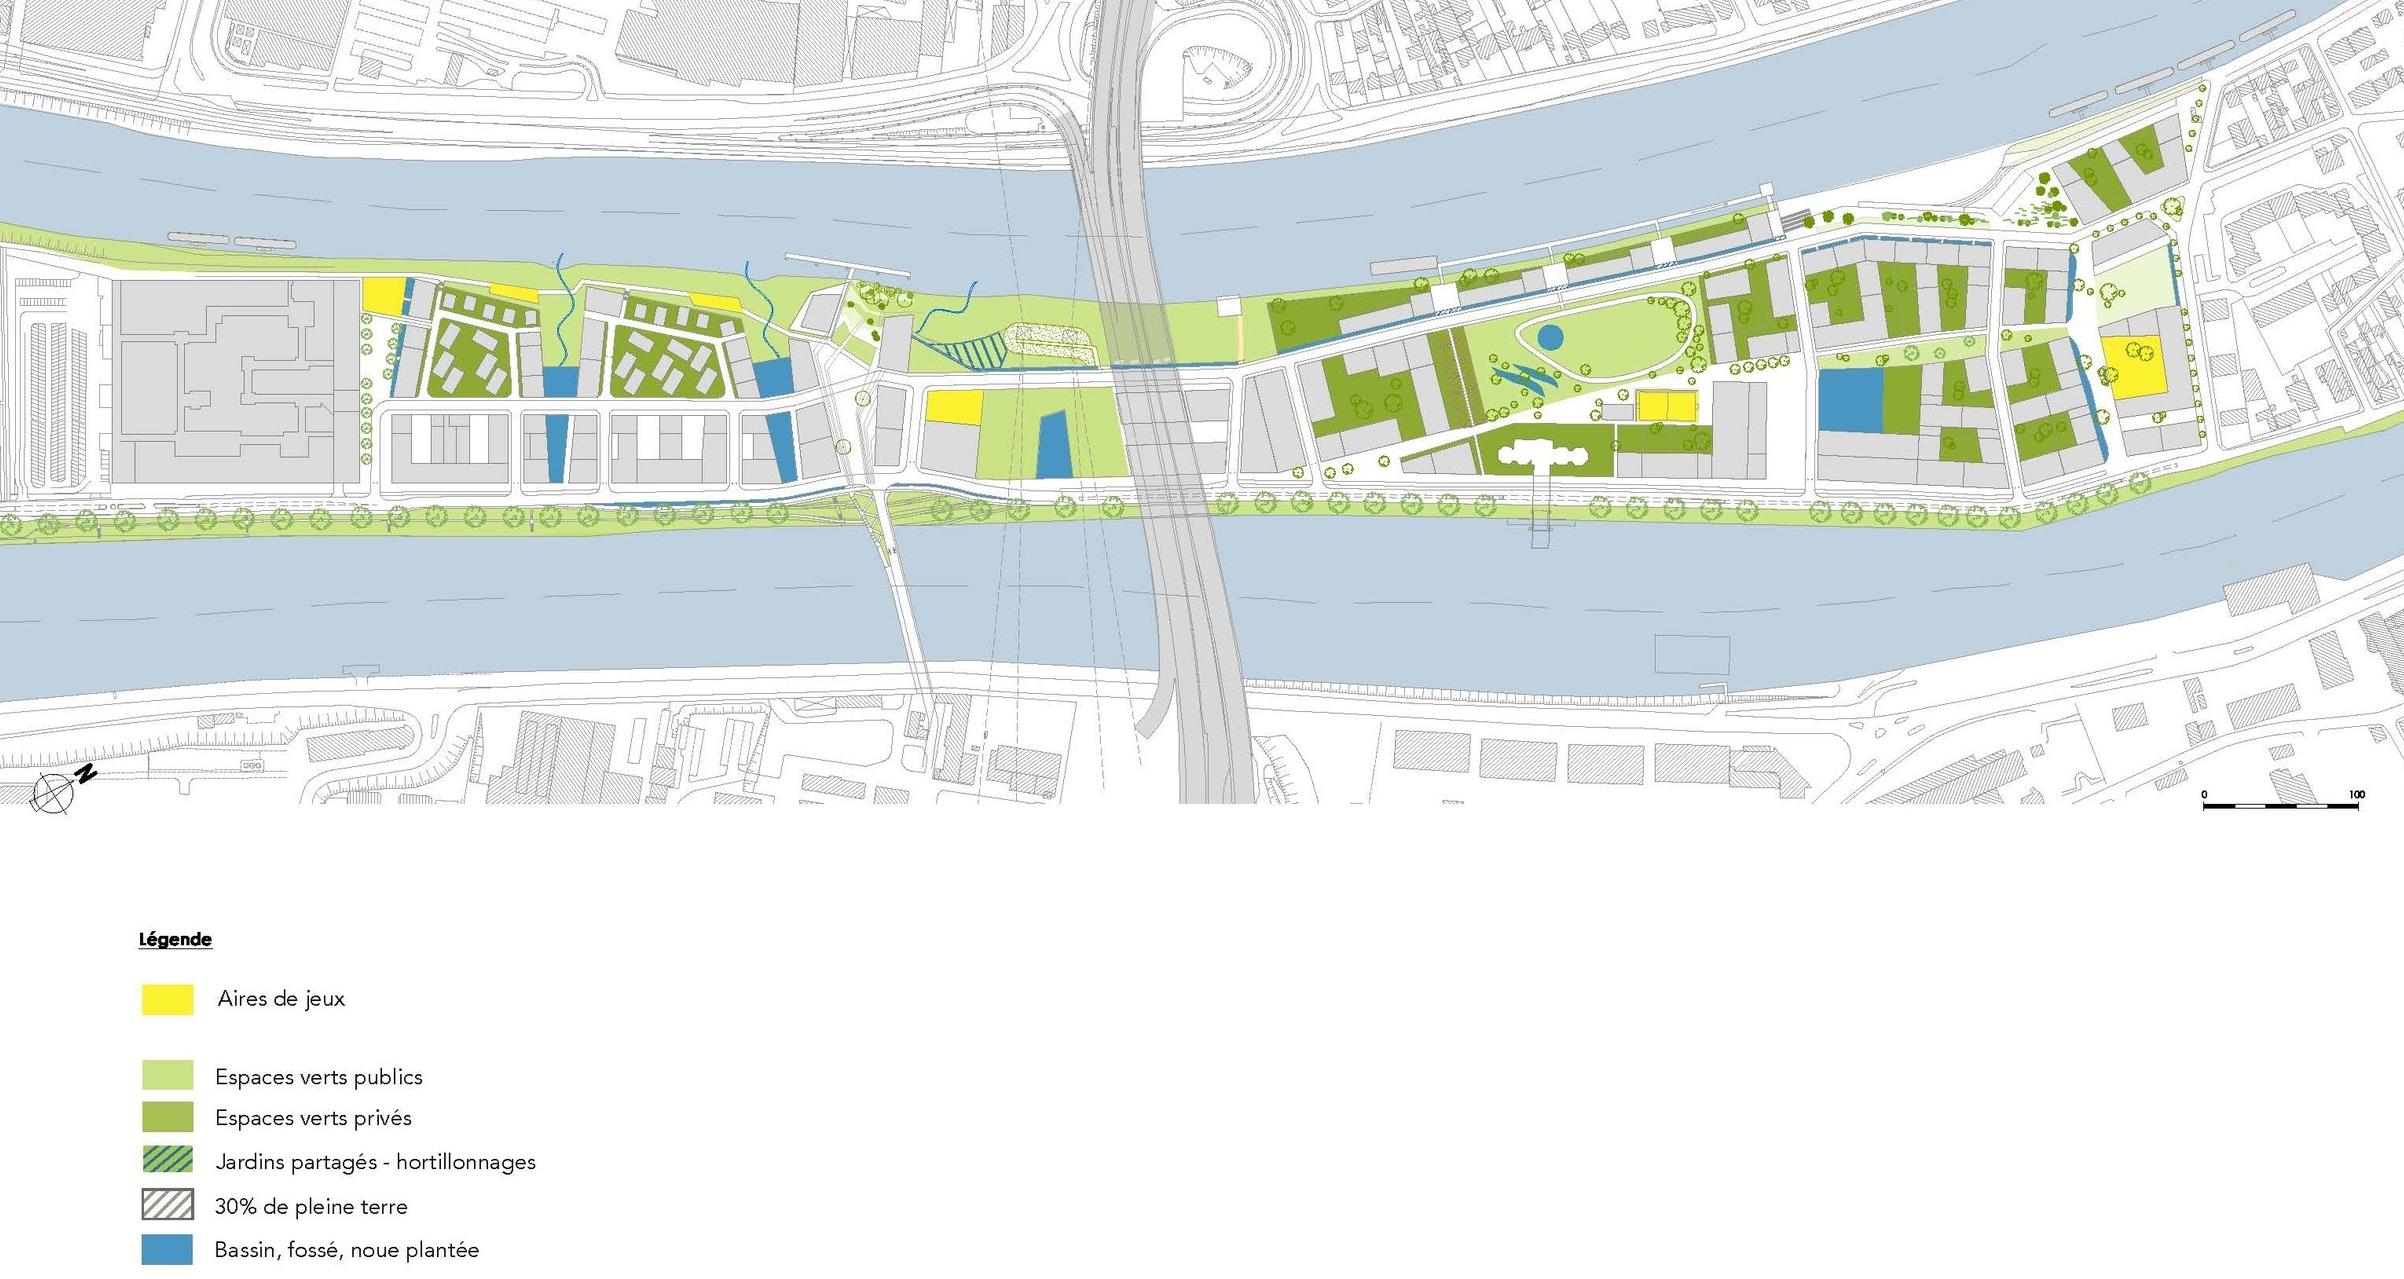 0.3 Plan paysage 2013 faute corrigee.jpg